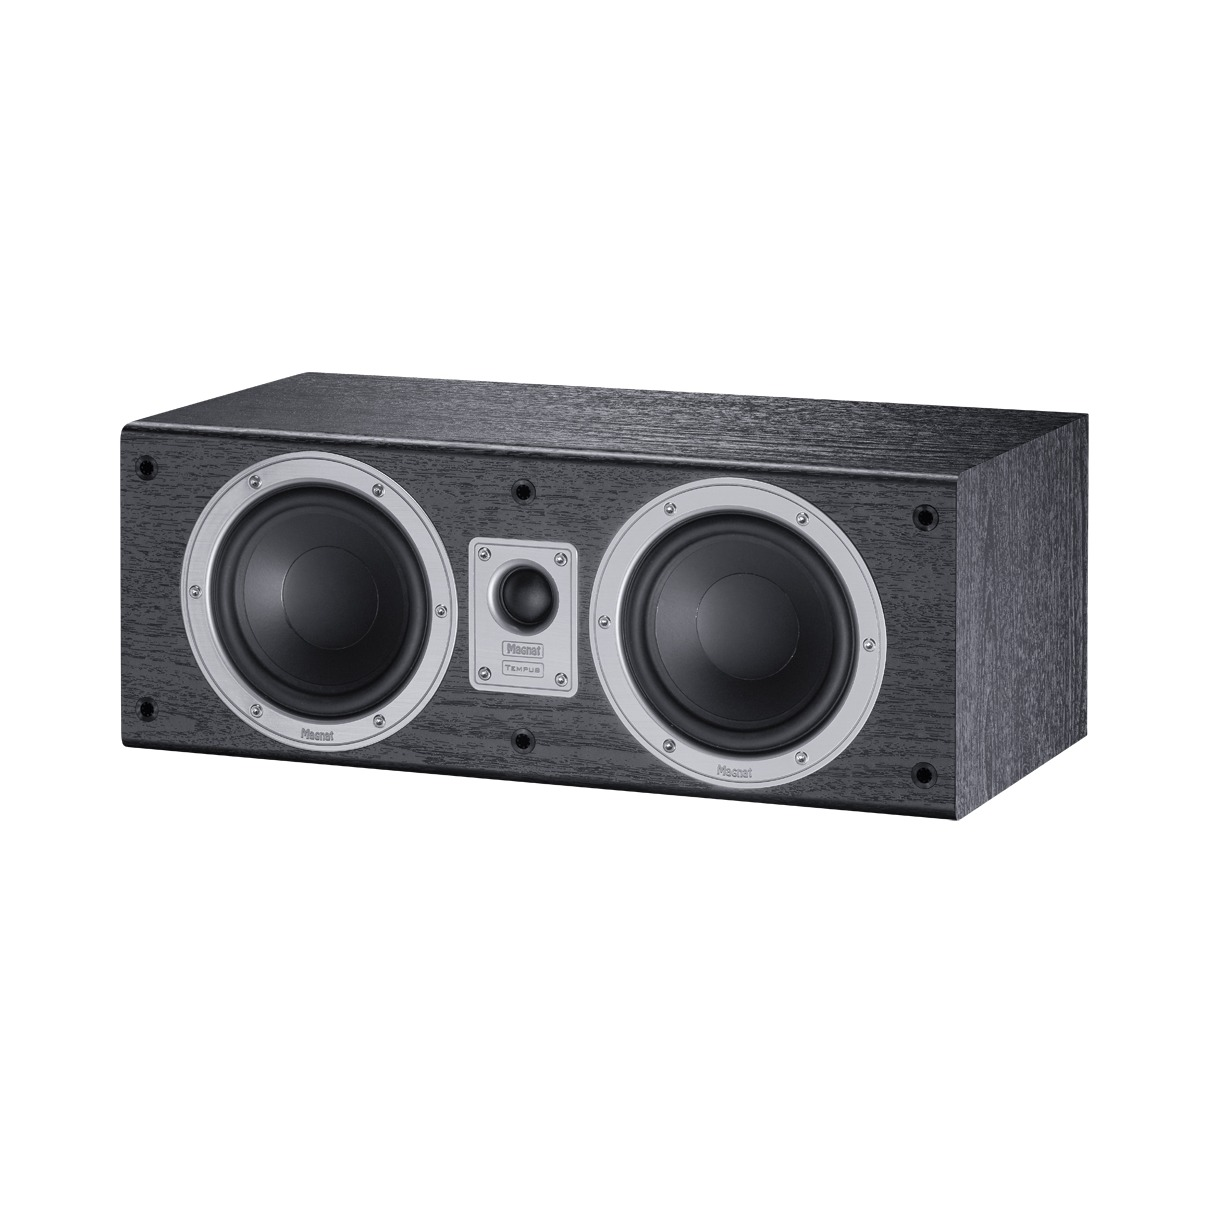 Magnat boekenplank speaker TEMPUS CENTER 22 zwart